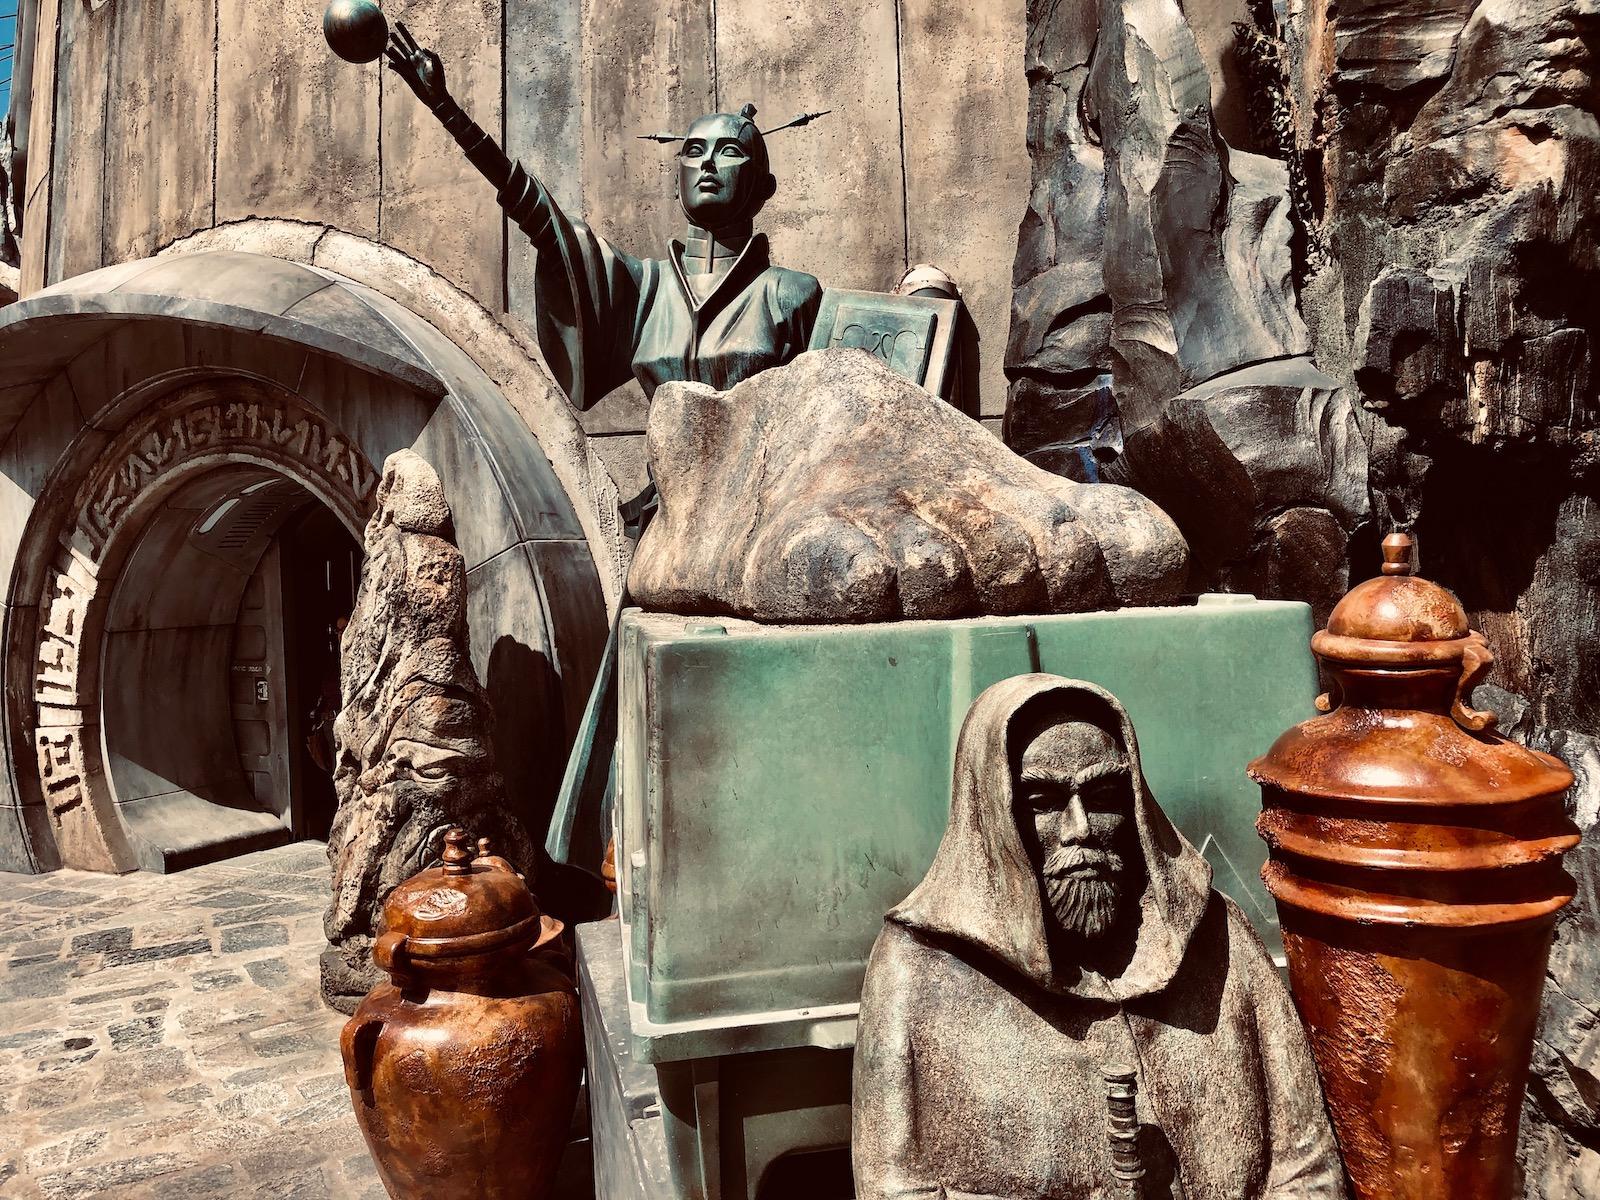 Dok-Ondar's Den of Antiquities Star Wars: Galaxy's Edge Easter Eggs